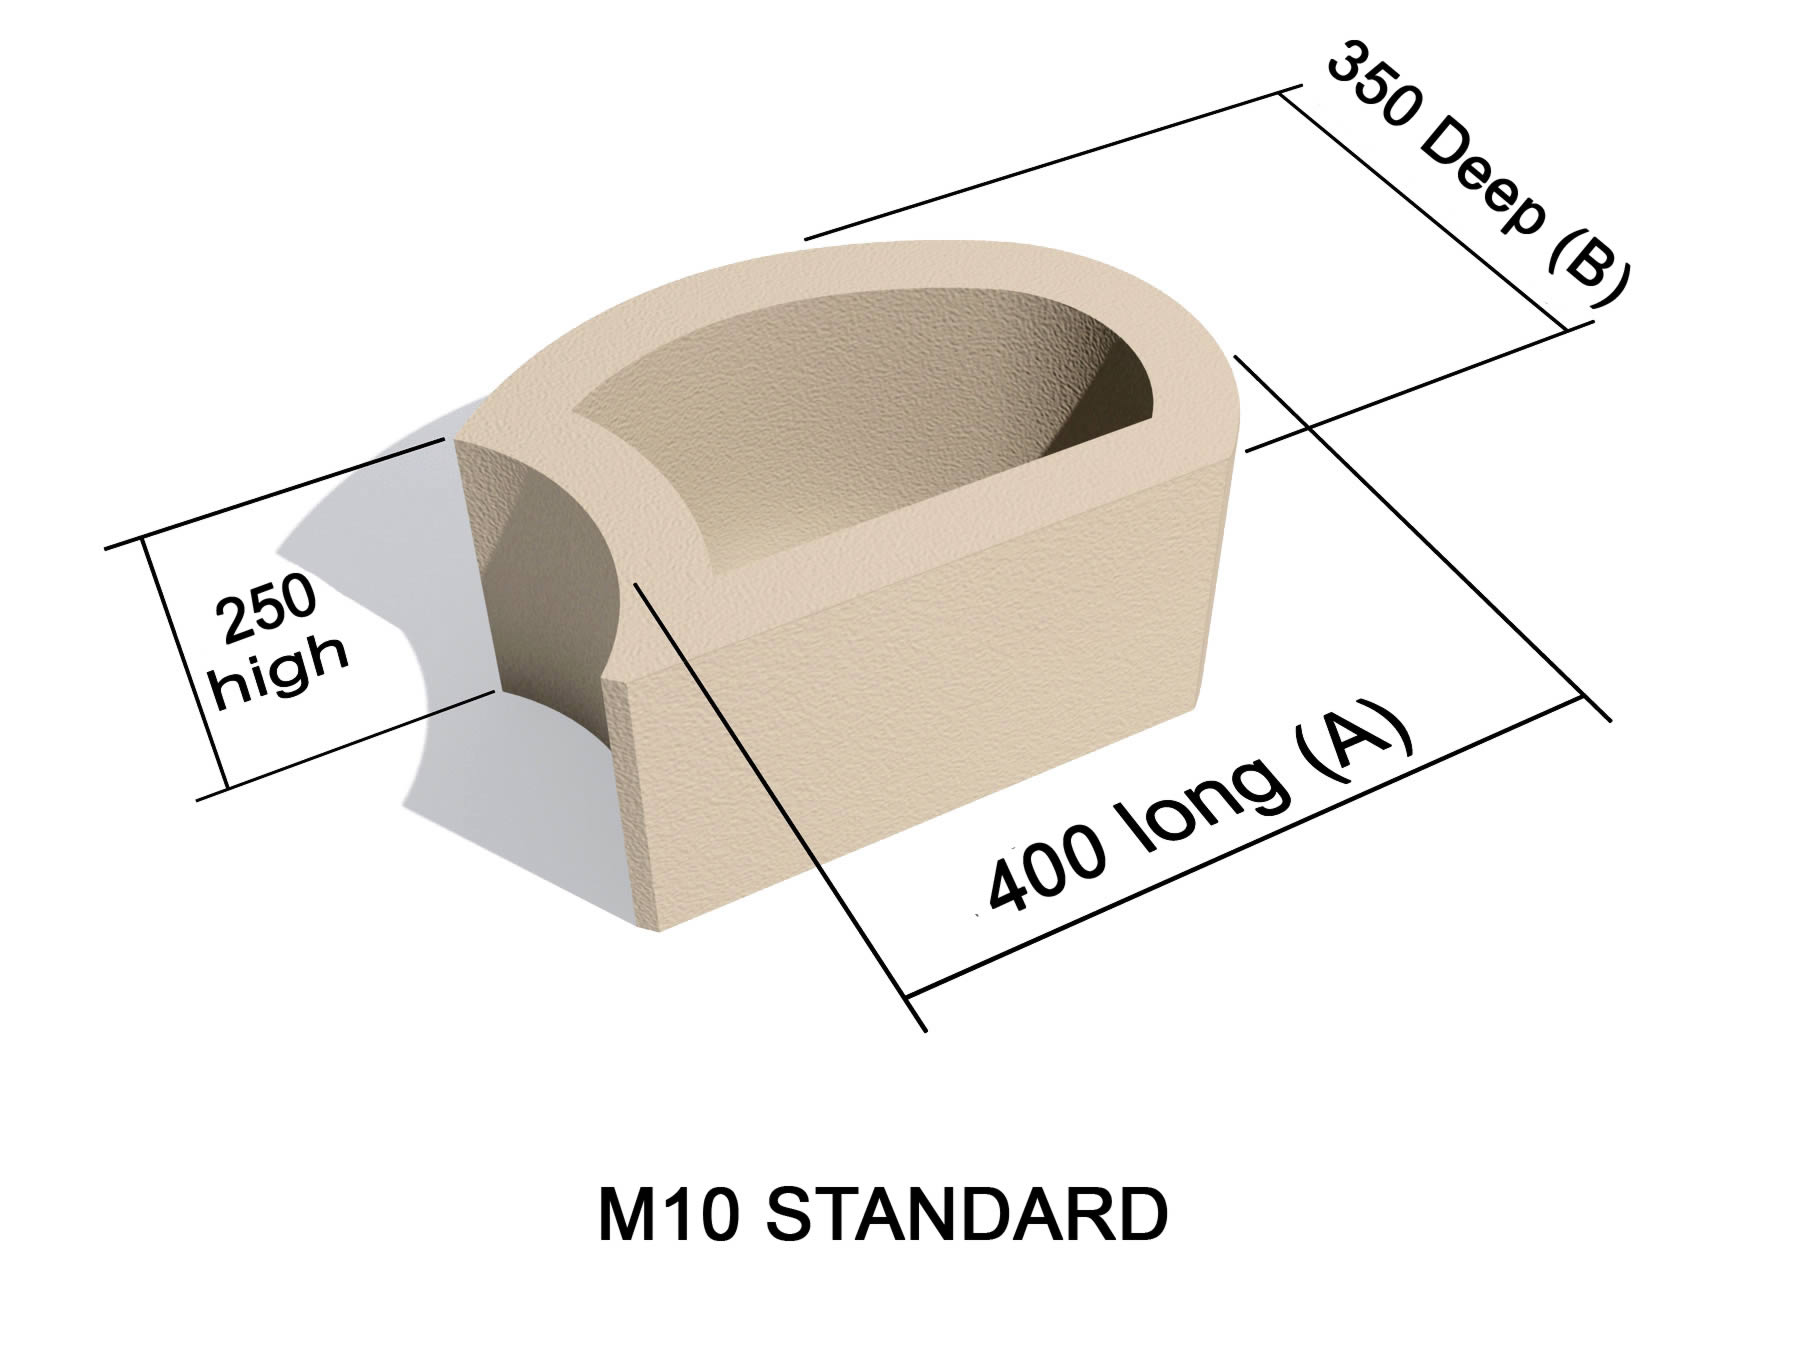 M10 Standard block